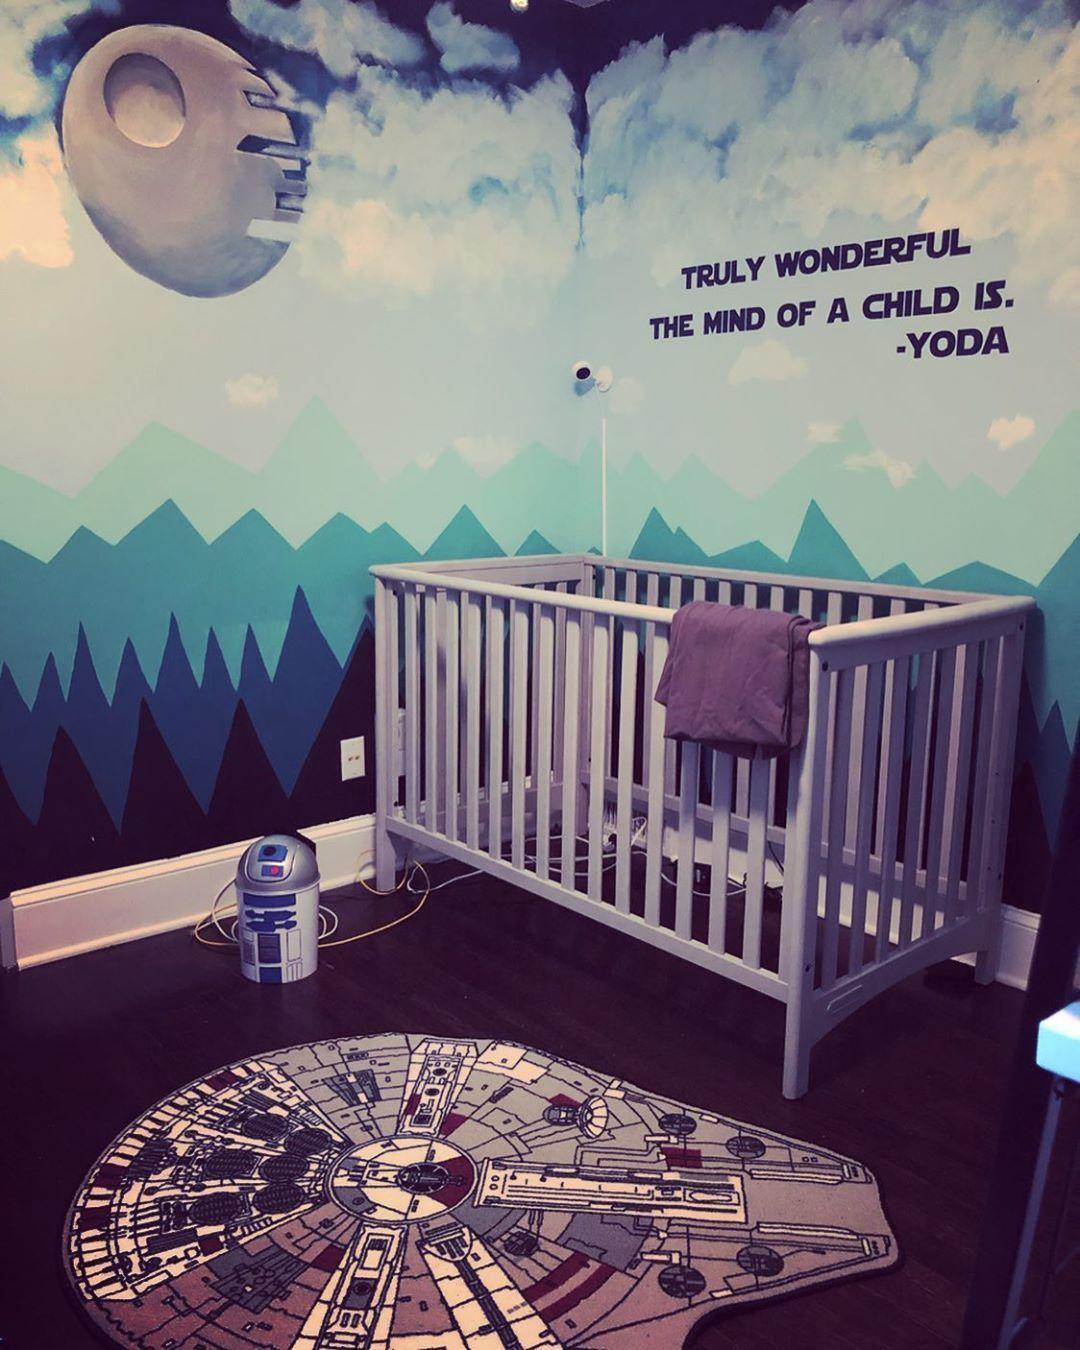 Star Wars Baby Star Wars Gifts 2019 In 2020 Star Wars Nursery Star Wars Baby Room Star Wars Kids Room